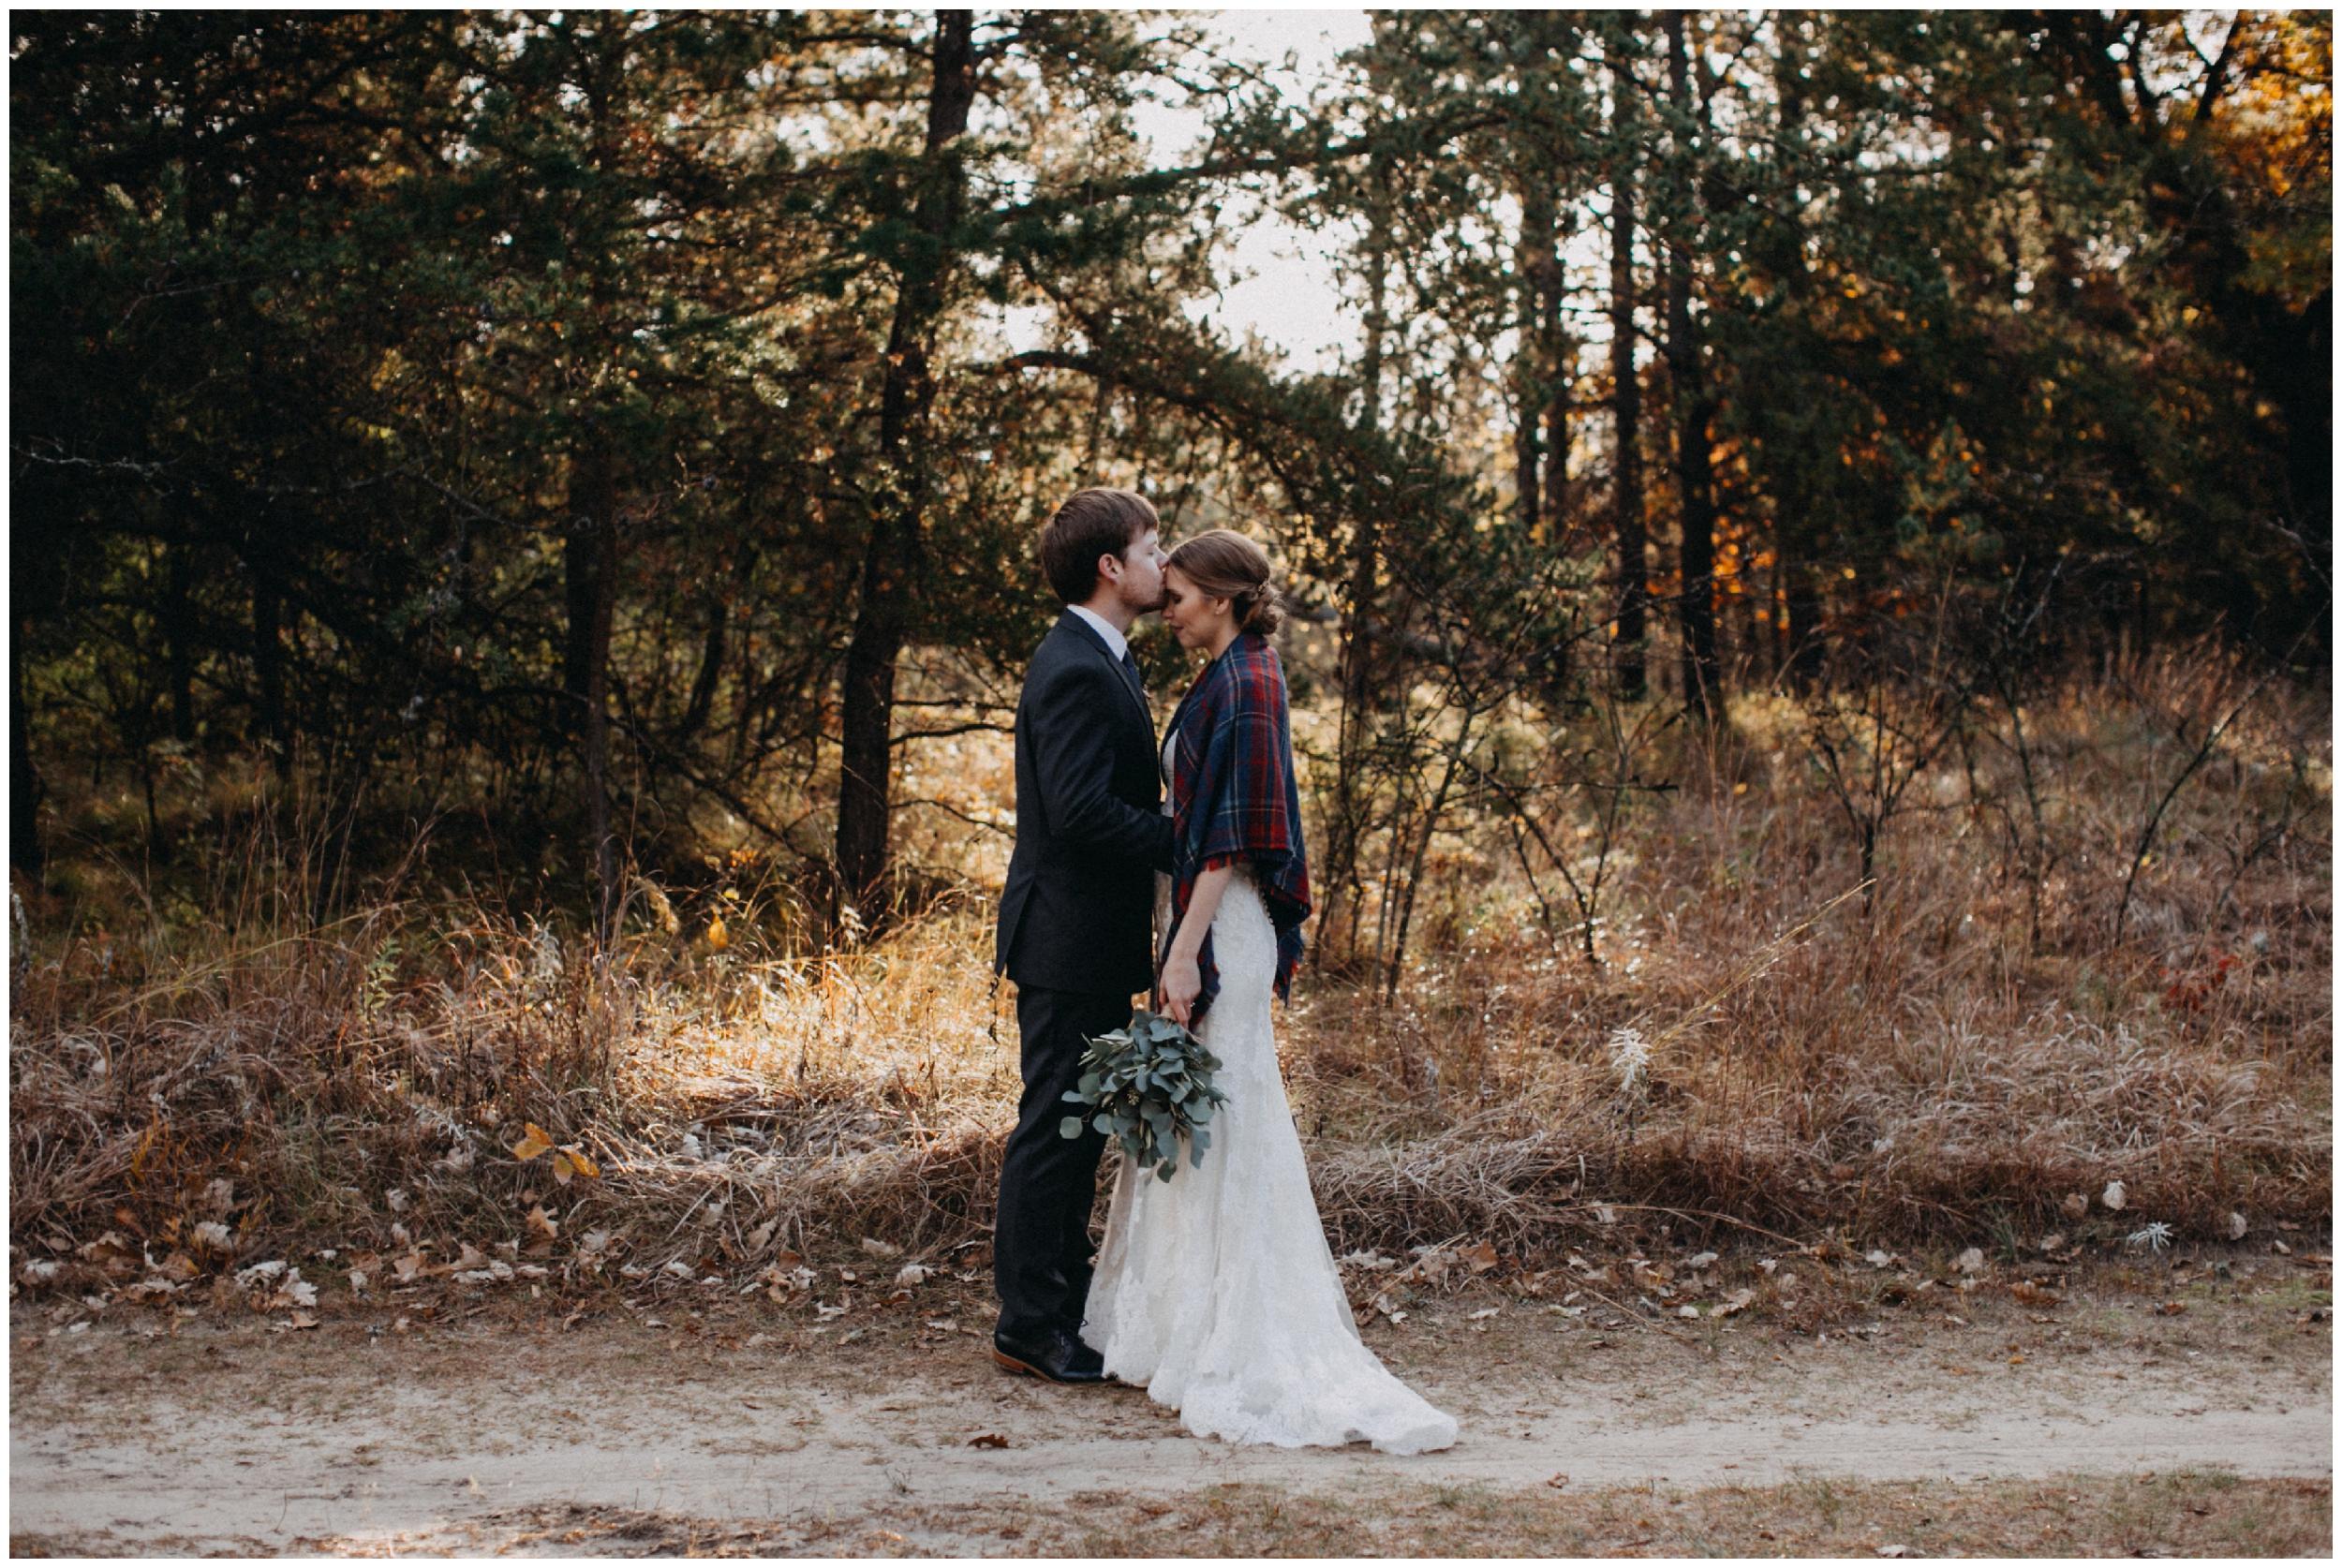 Quaint fall wedding at the Northland Arboretum